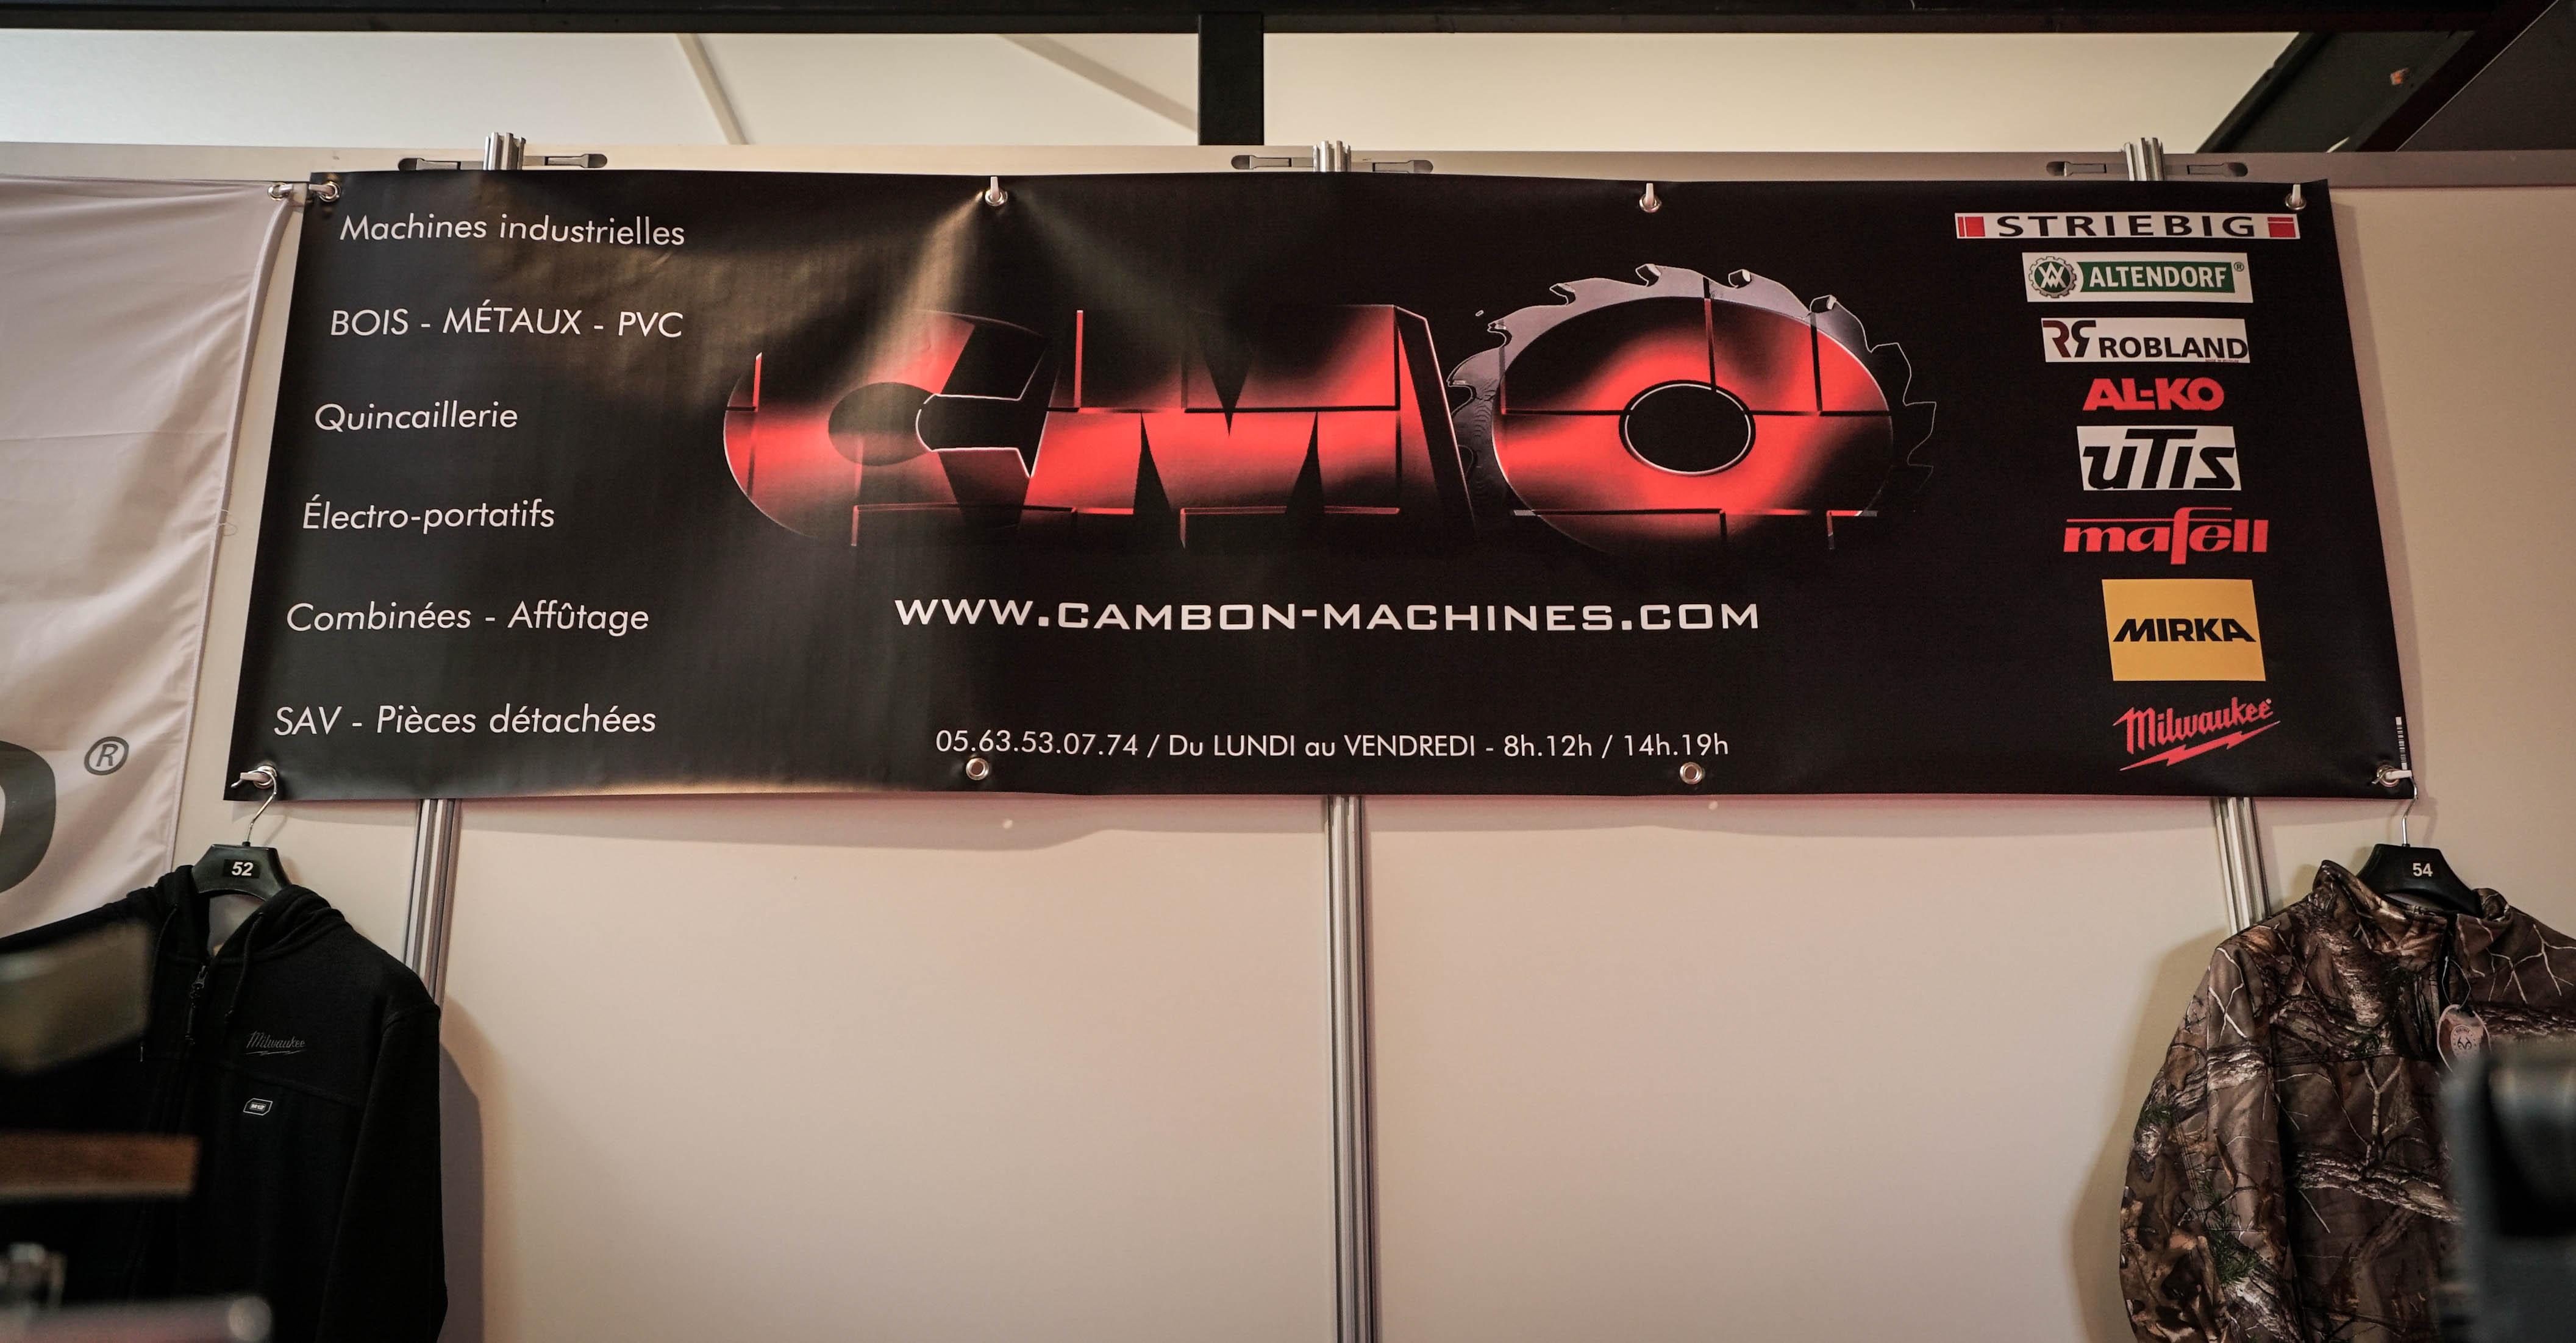 www.cambon-machines.com